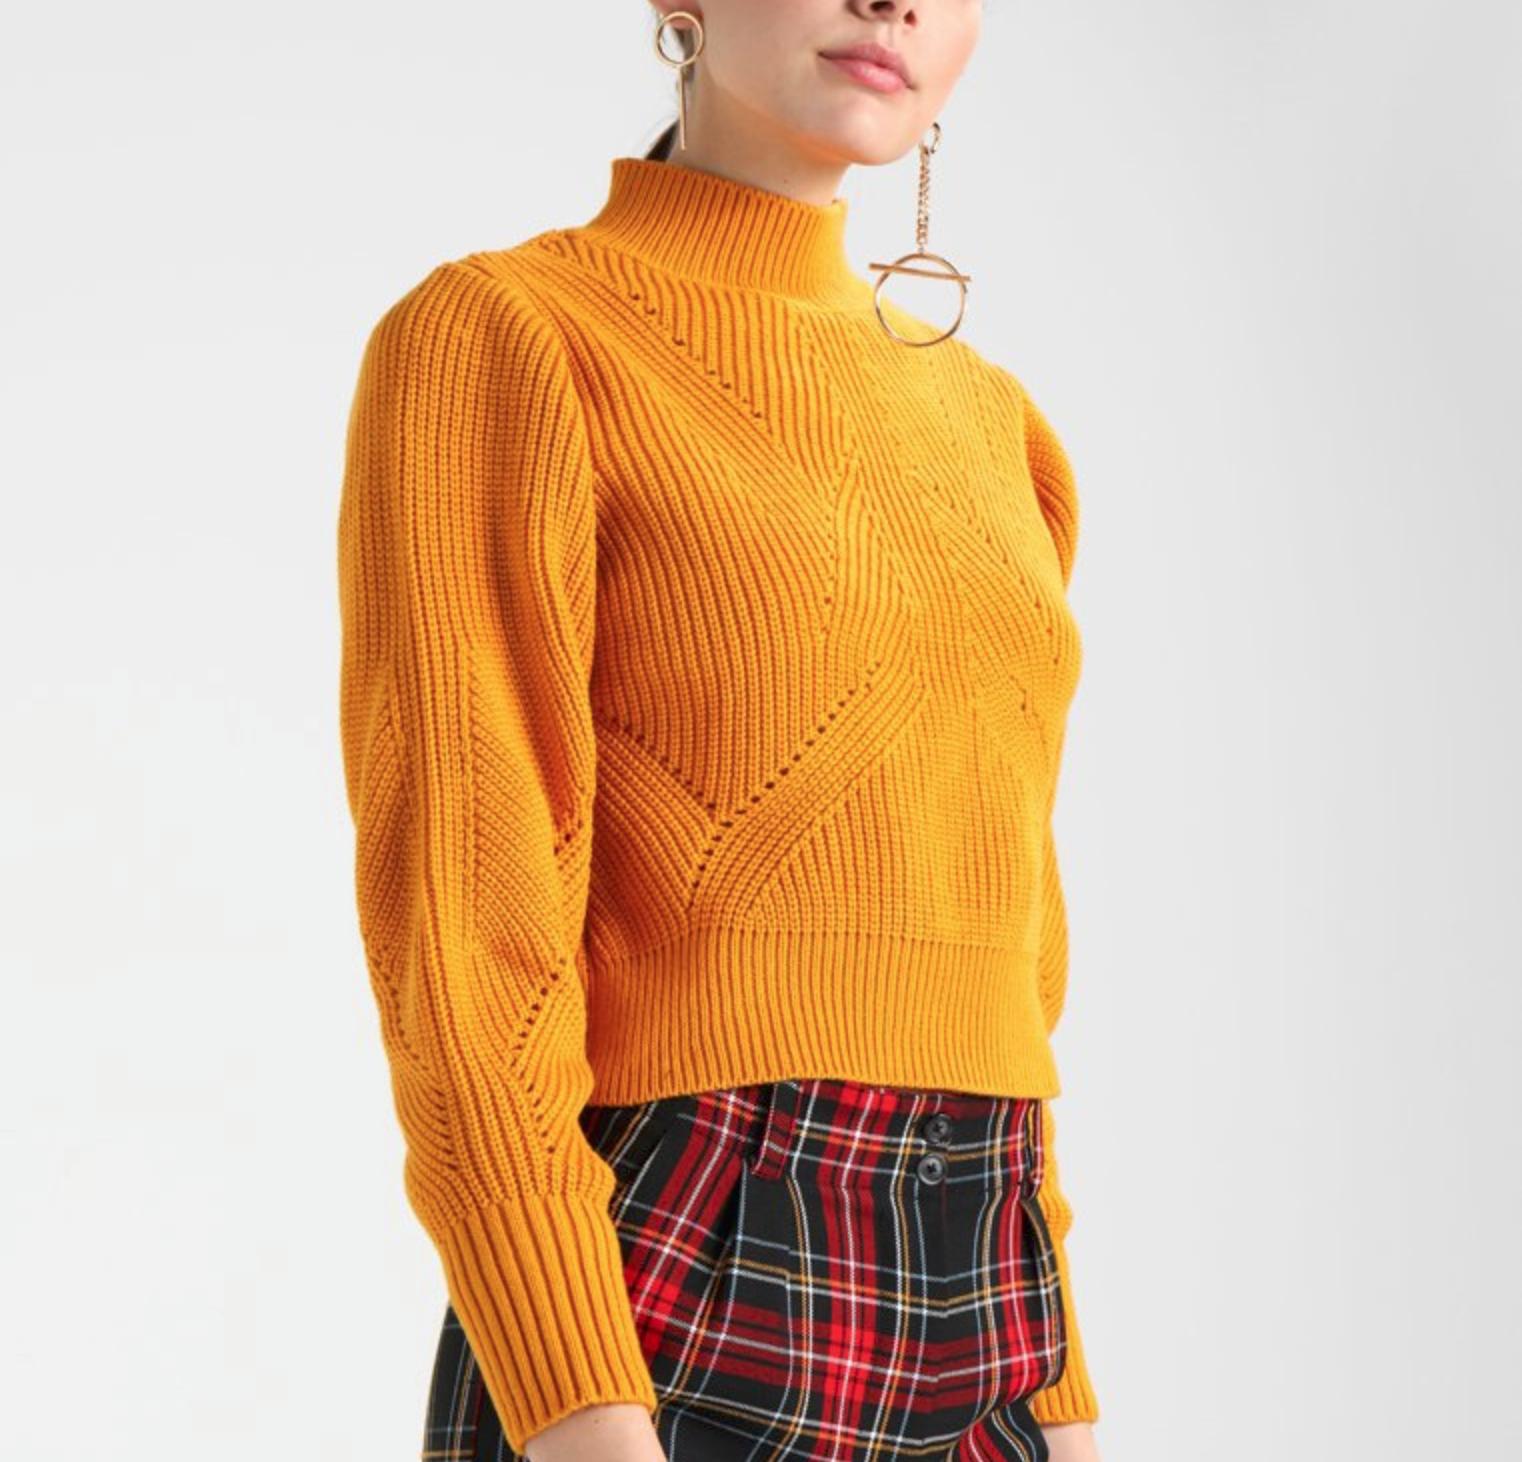 Topshop-sweater